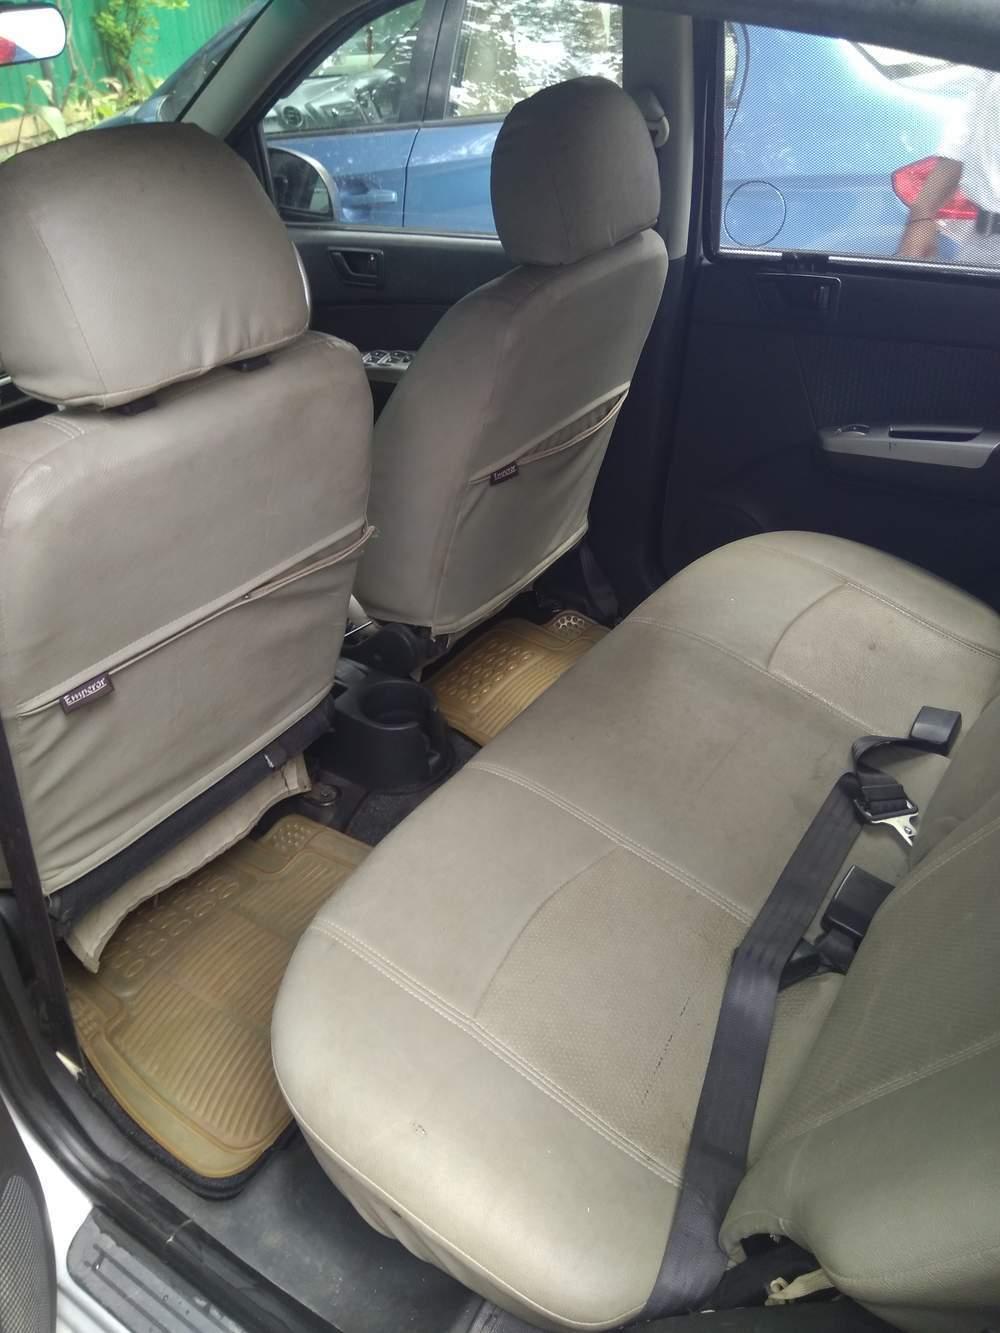 Hyundai Getz Left Side View